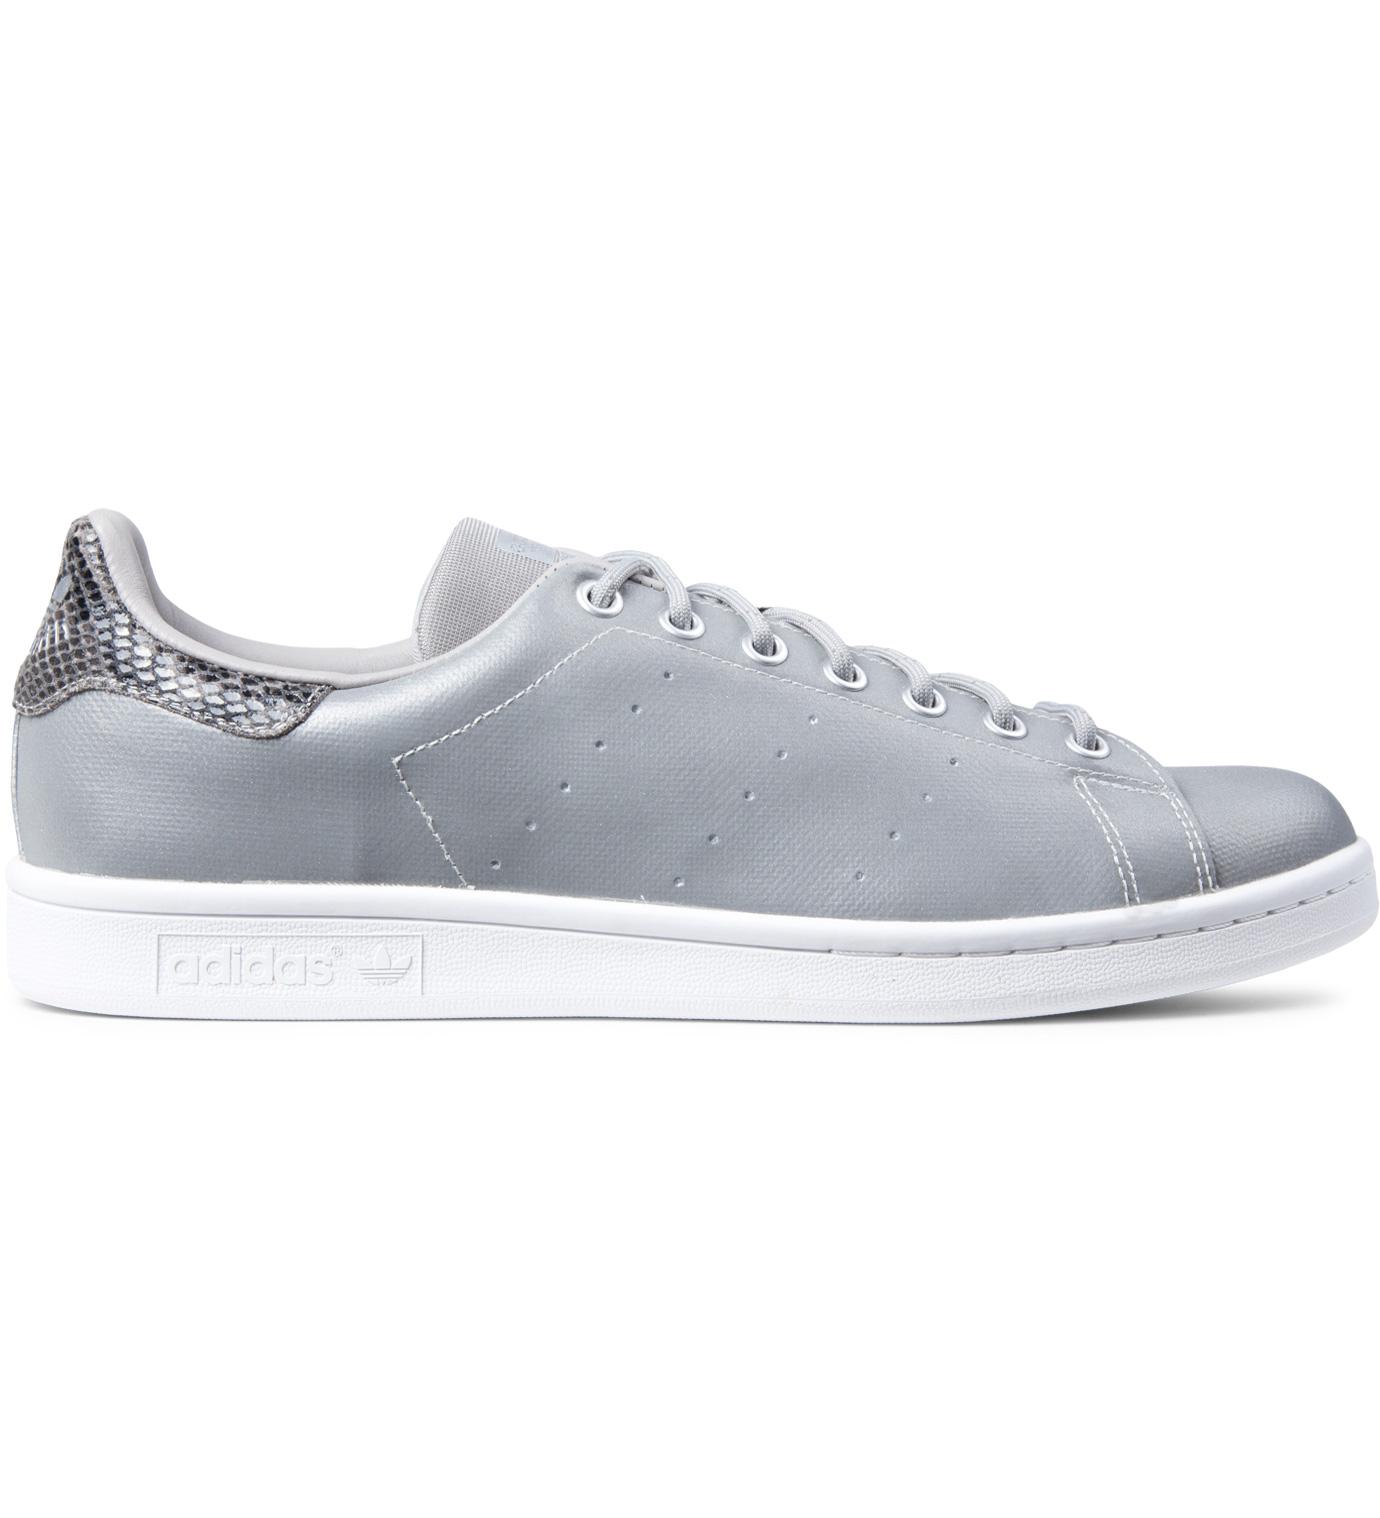 adidas originals silver stan smith m17918 shoes hbx. Black Bedroom Furniture Sets. Home Design Ideas